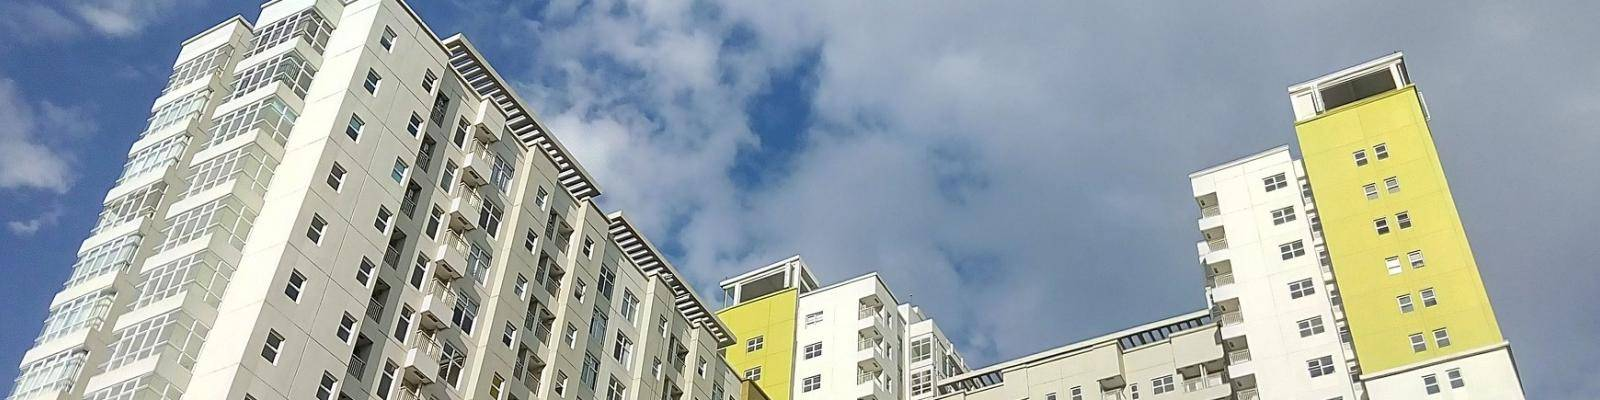 Appartementcomplexen